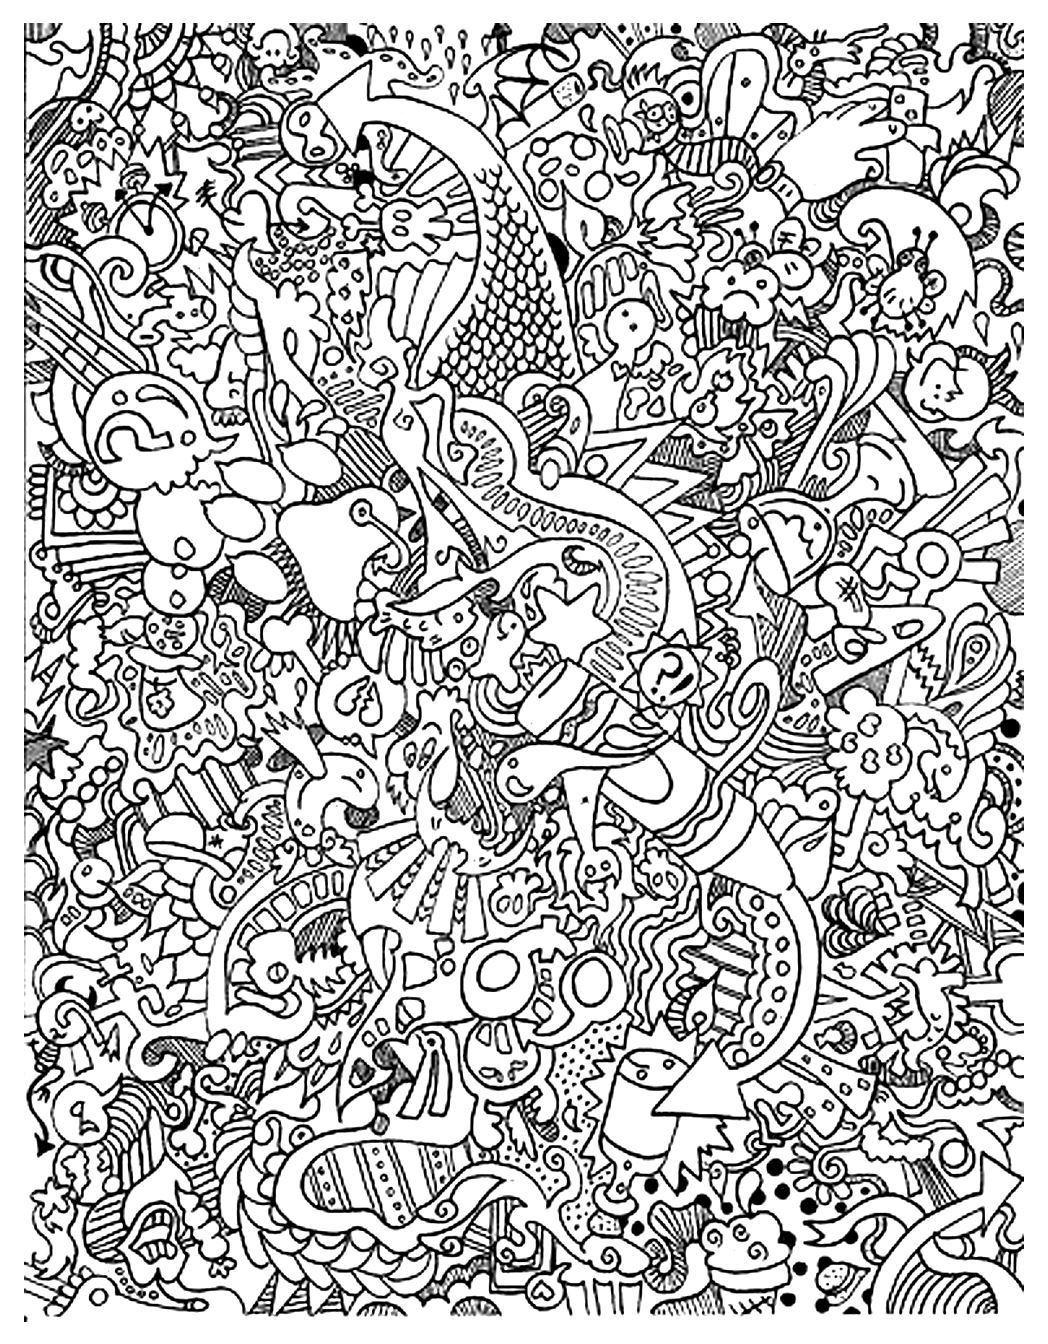 - Doodle Art To Color For Children - Doodle Art Kids Coloring Pages